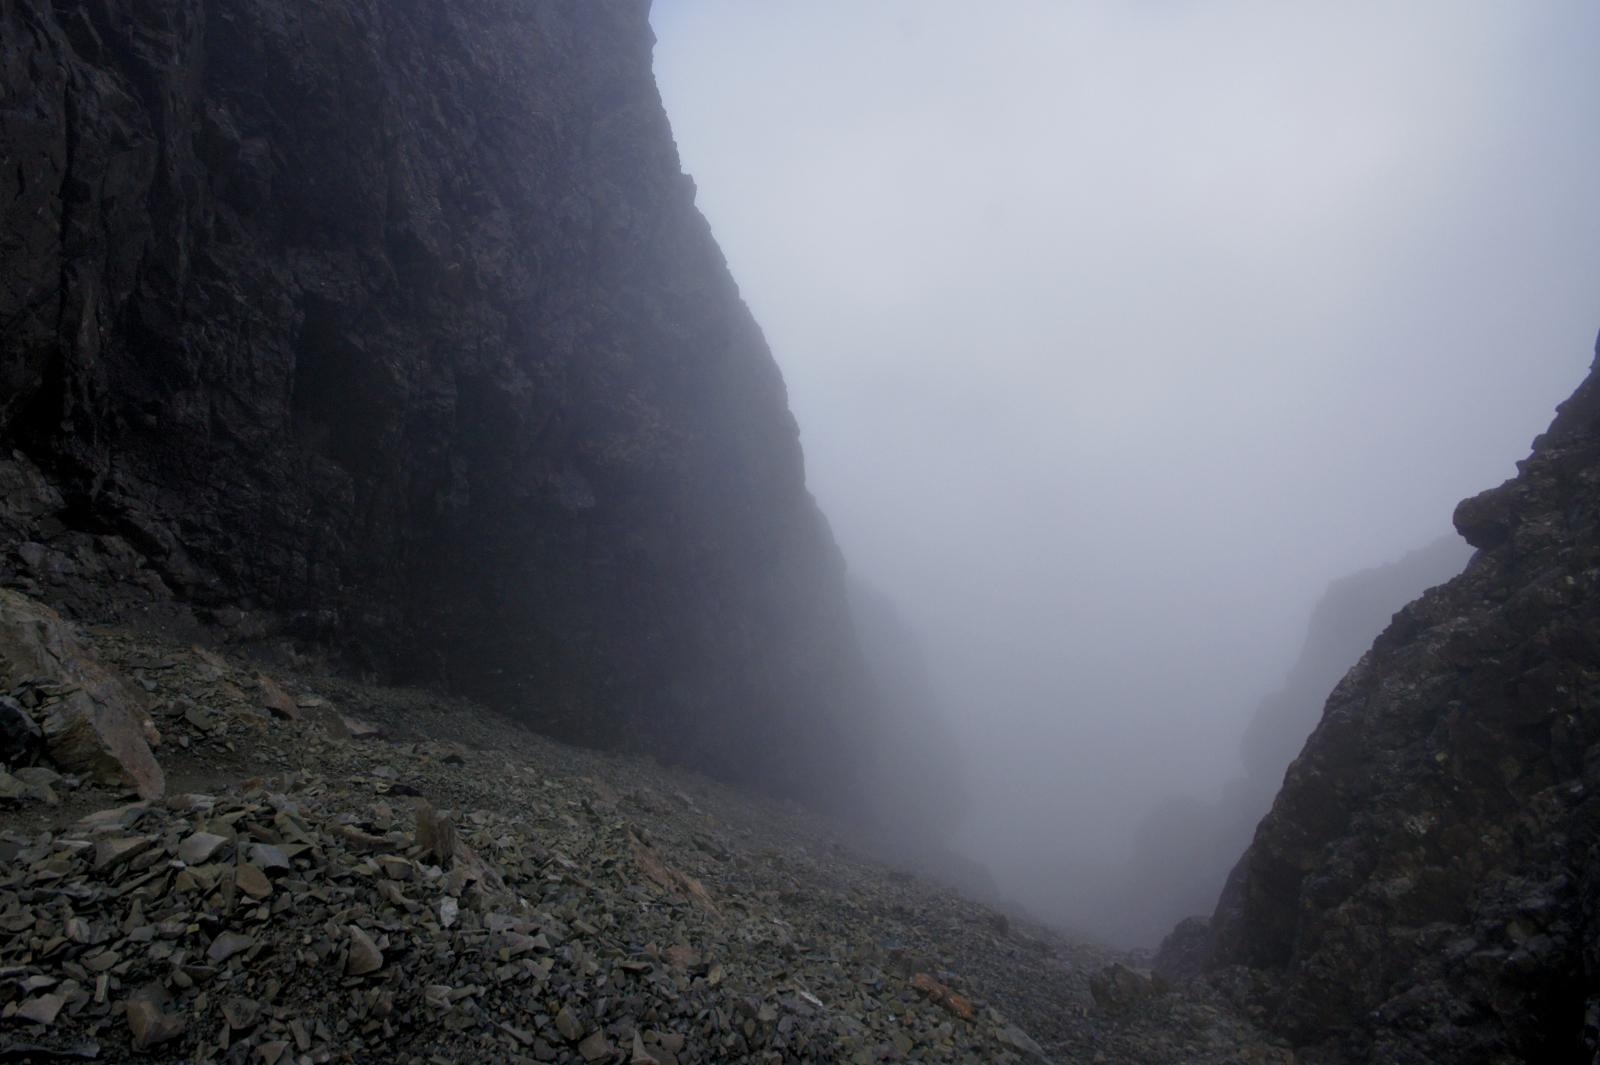 Kieran Rae Skye Black Cuillin Scotland Mist